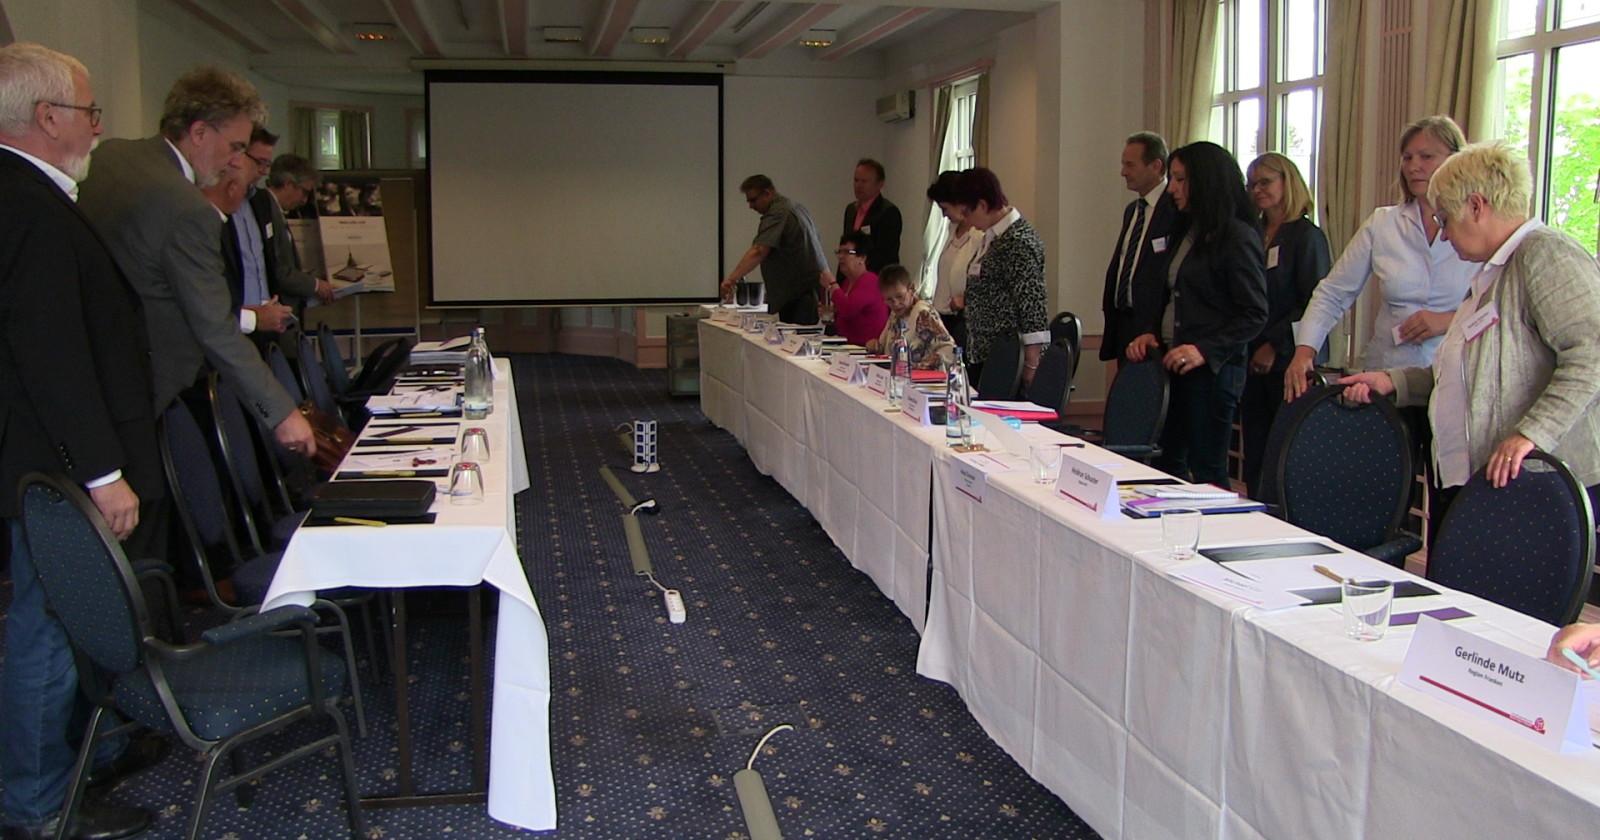 Arbeitgeber drohen Verhandlungen platzen zu lassen